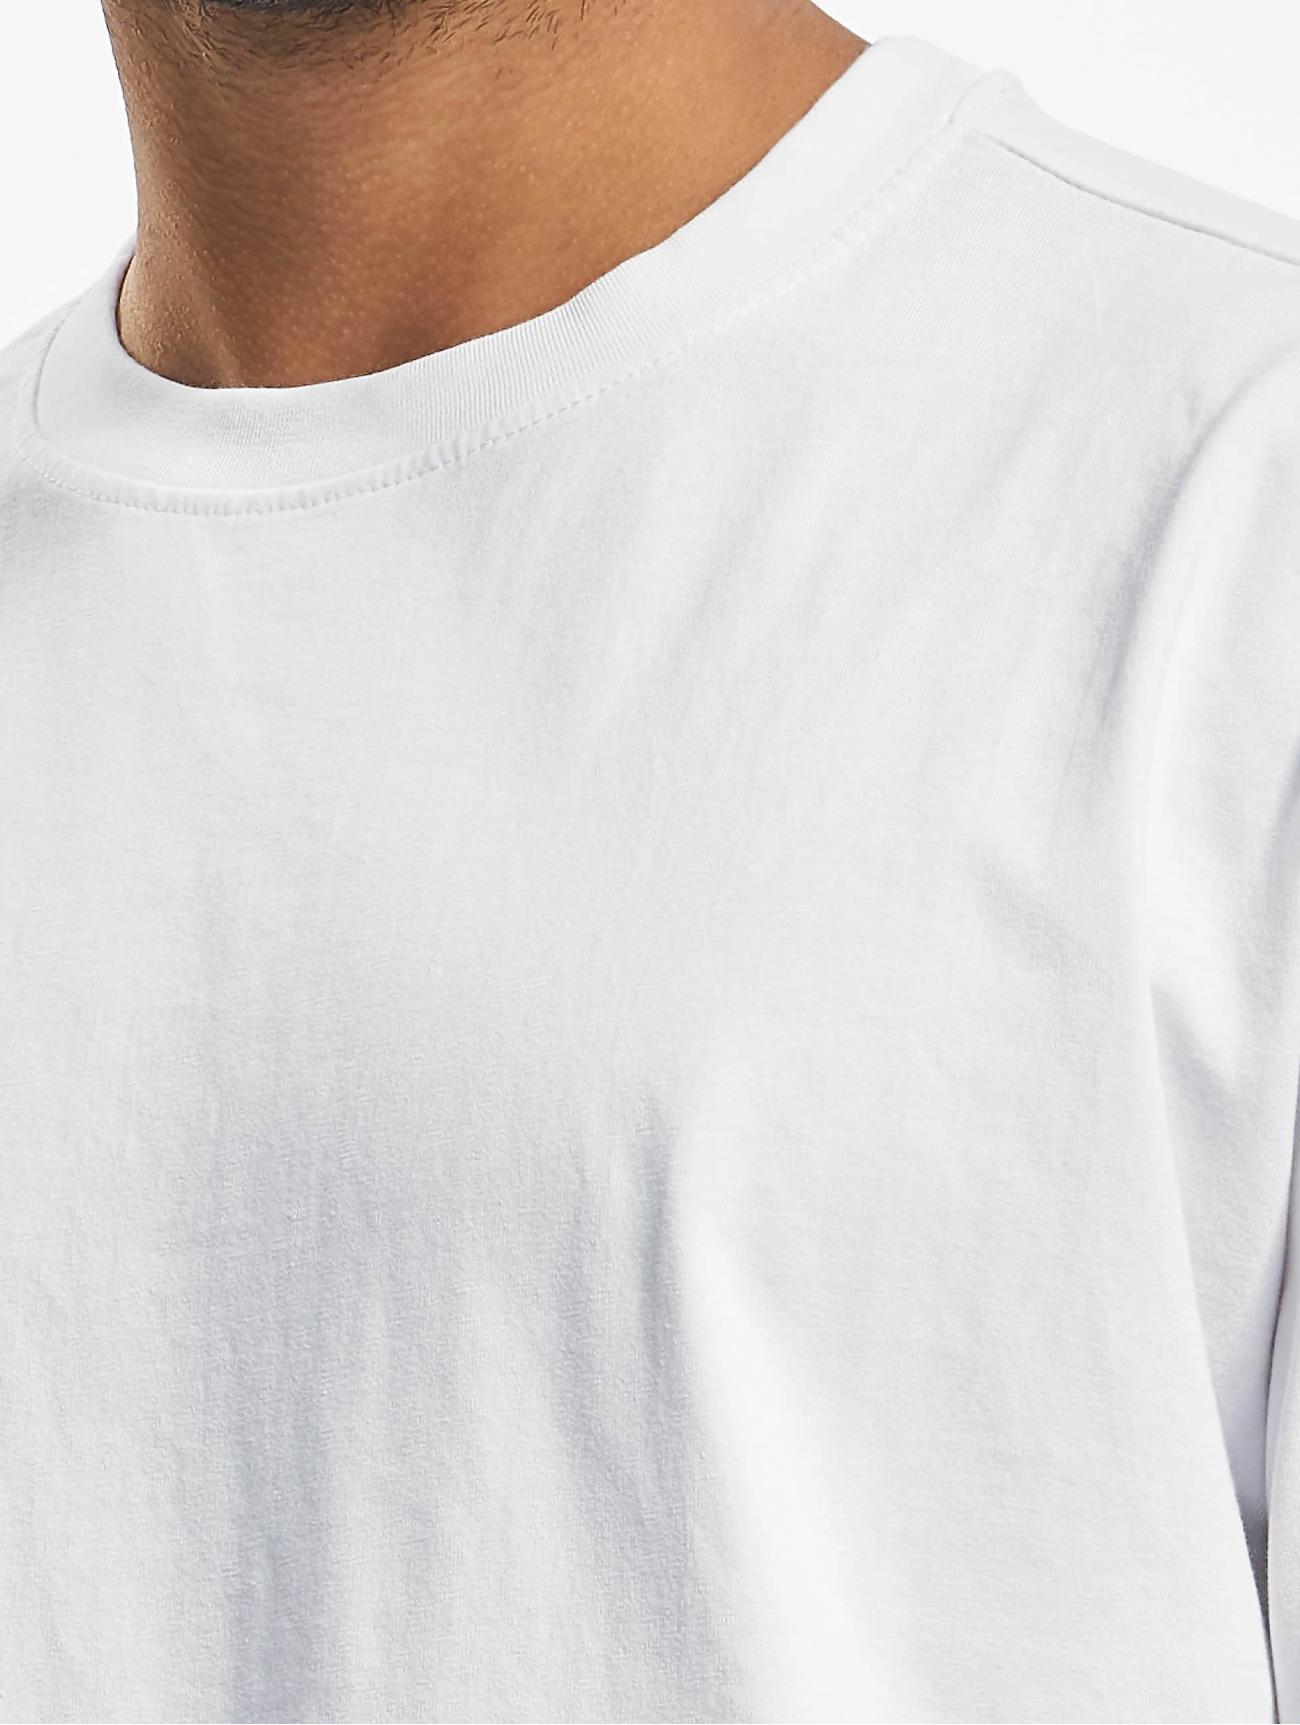 Urban Classics | Boxy Heavy  blanc Homme T-Shirt manches longues  562875| Homme Hauts